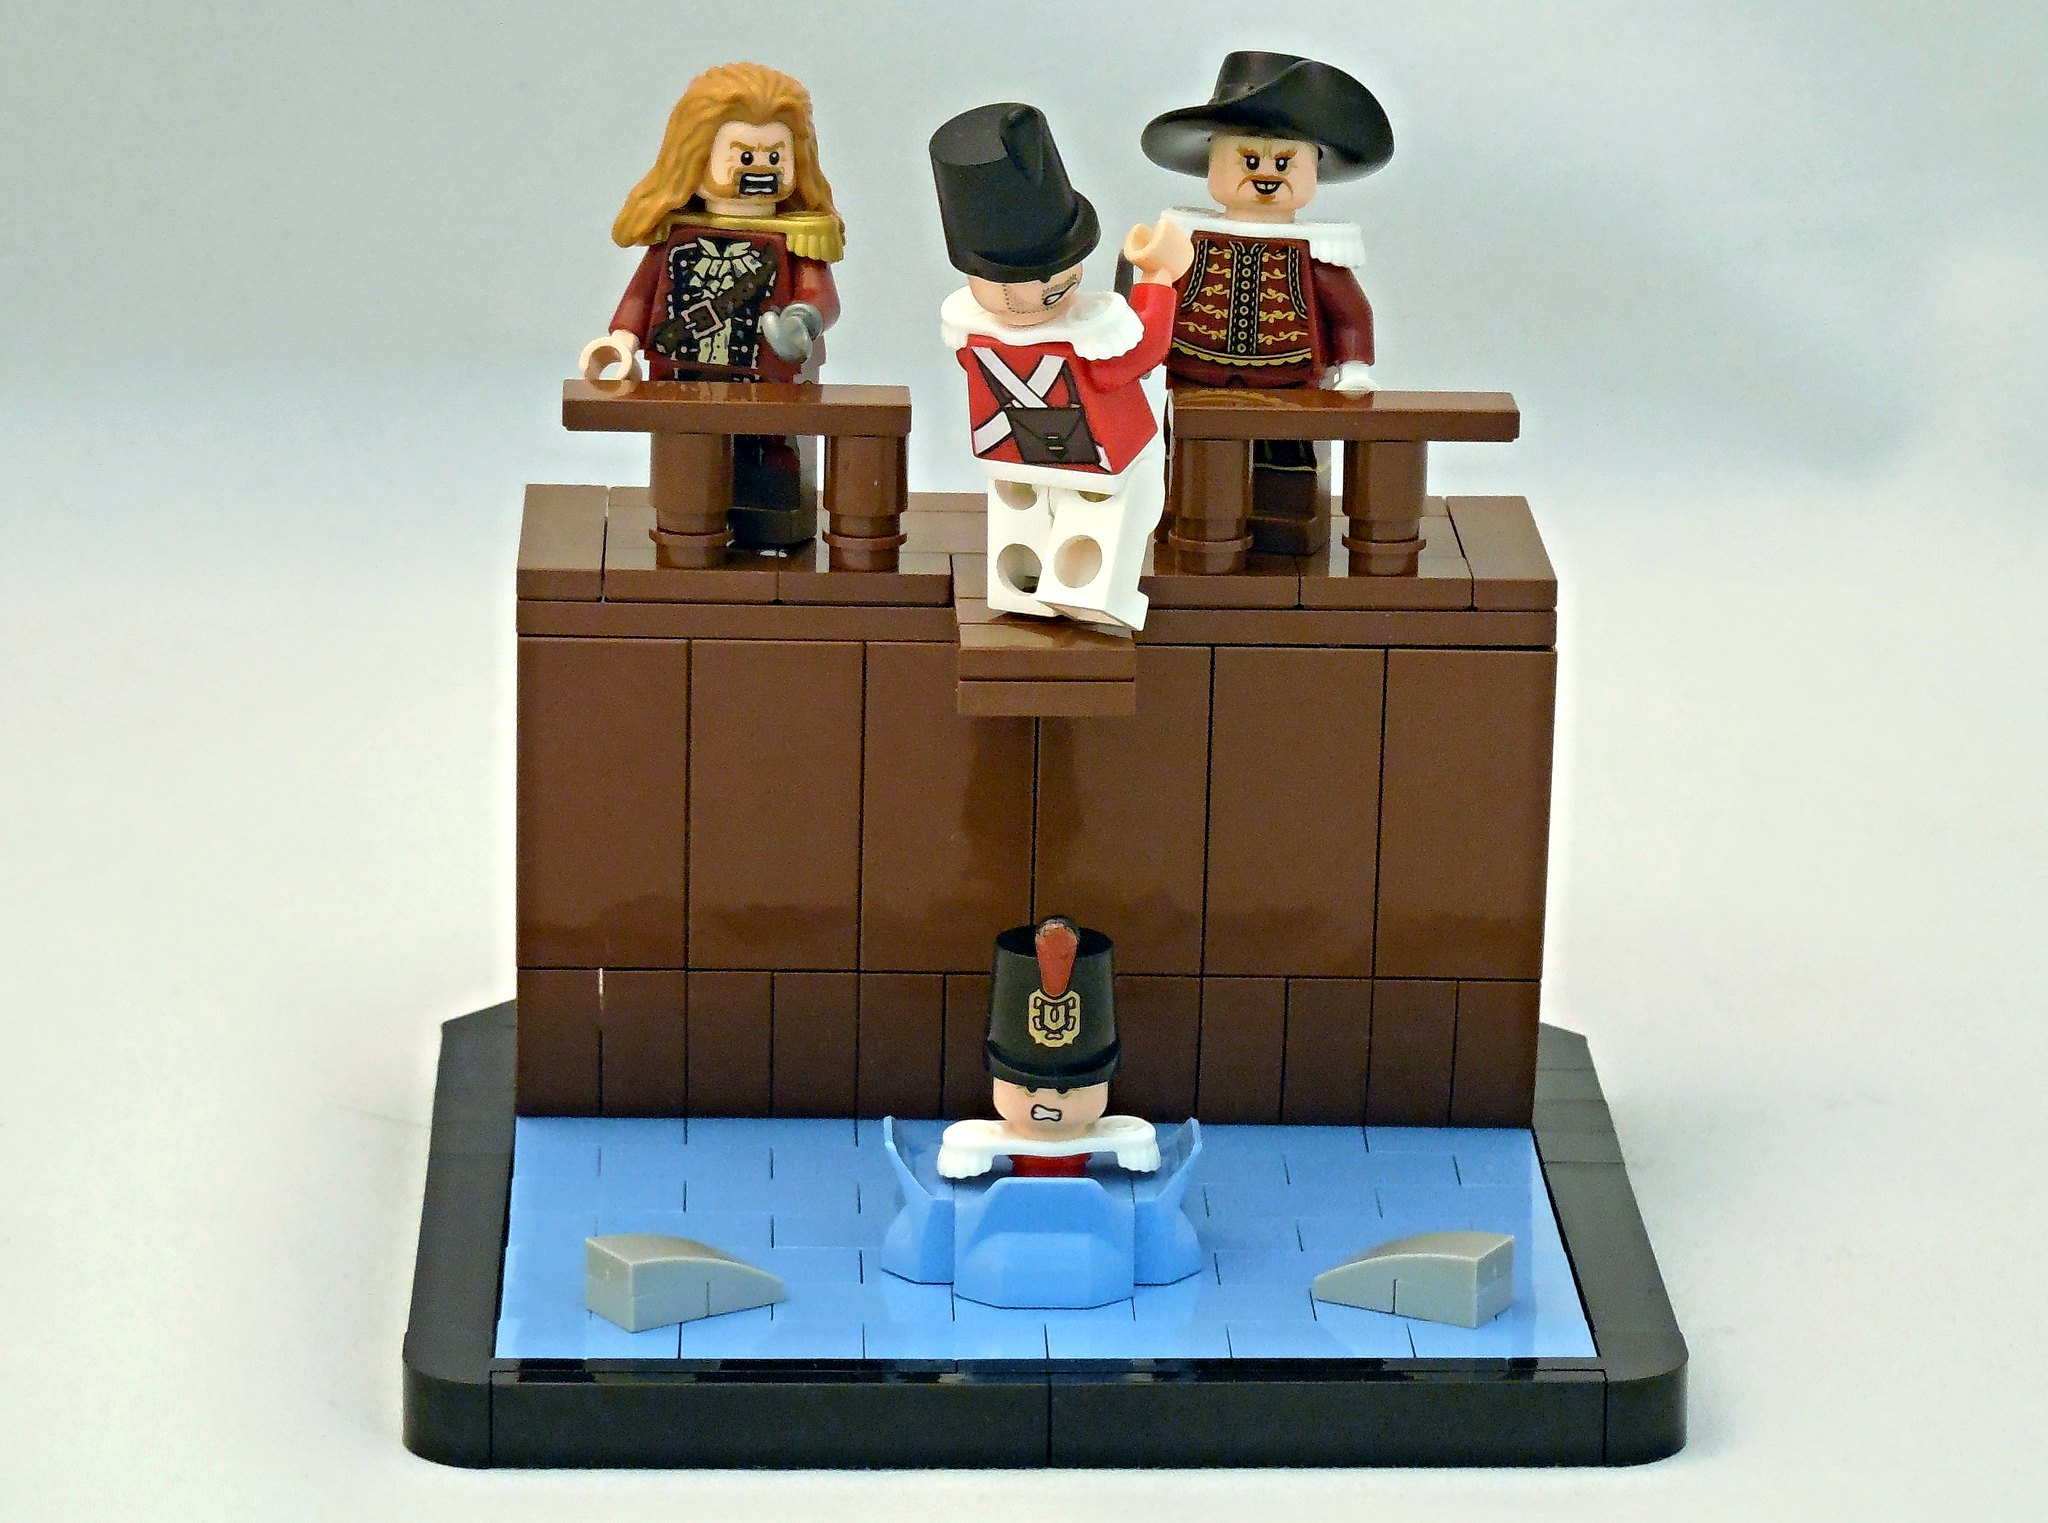 LEGO® MOC by Vitreolum: Walk the Plank